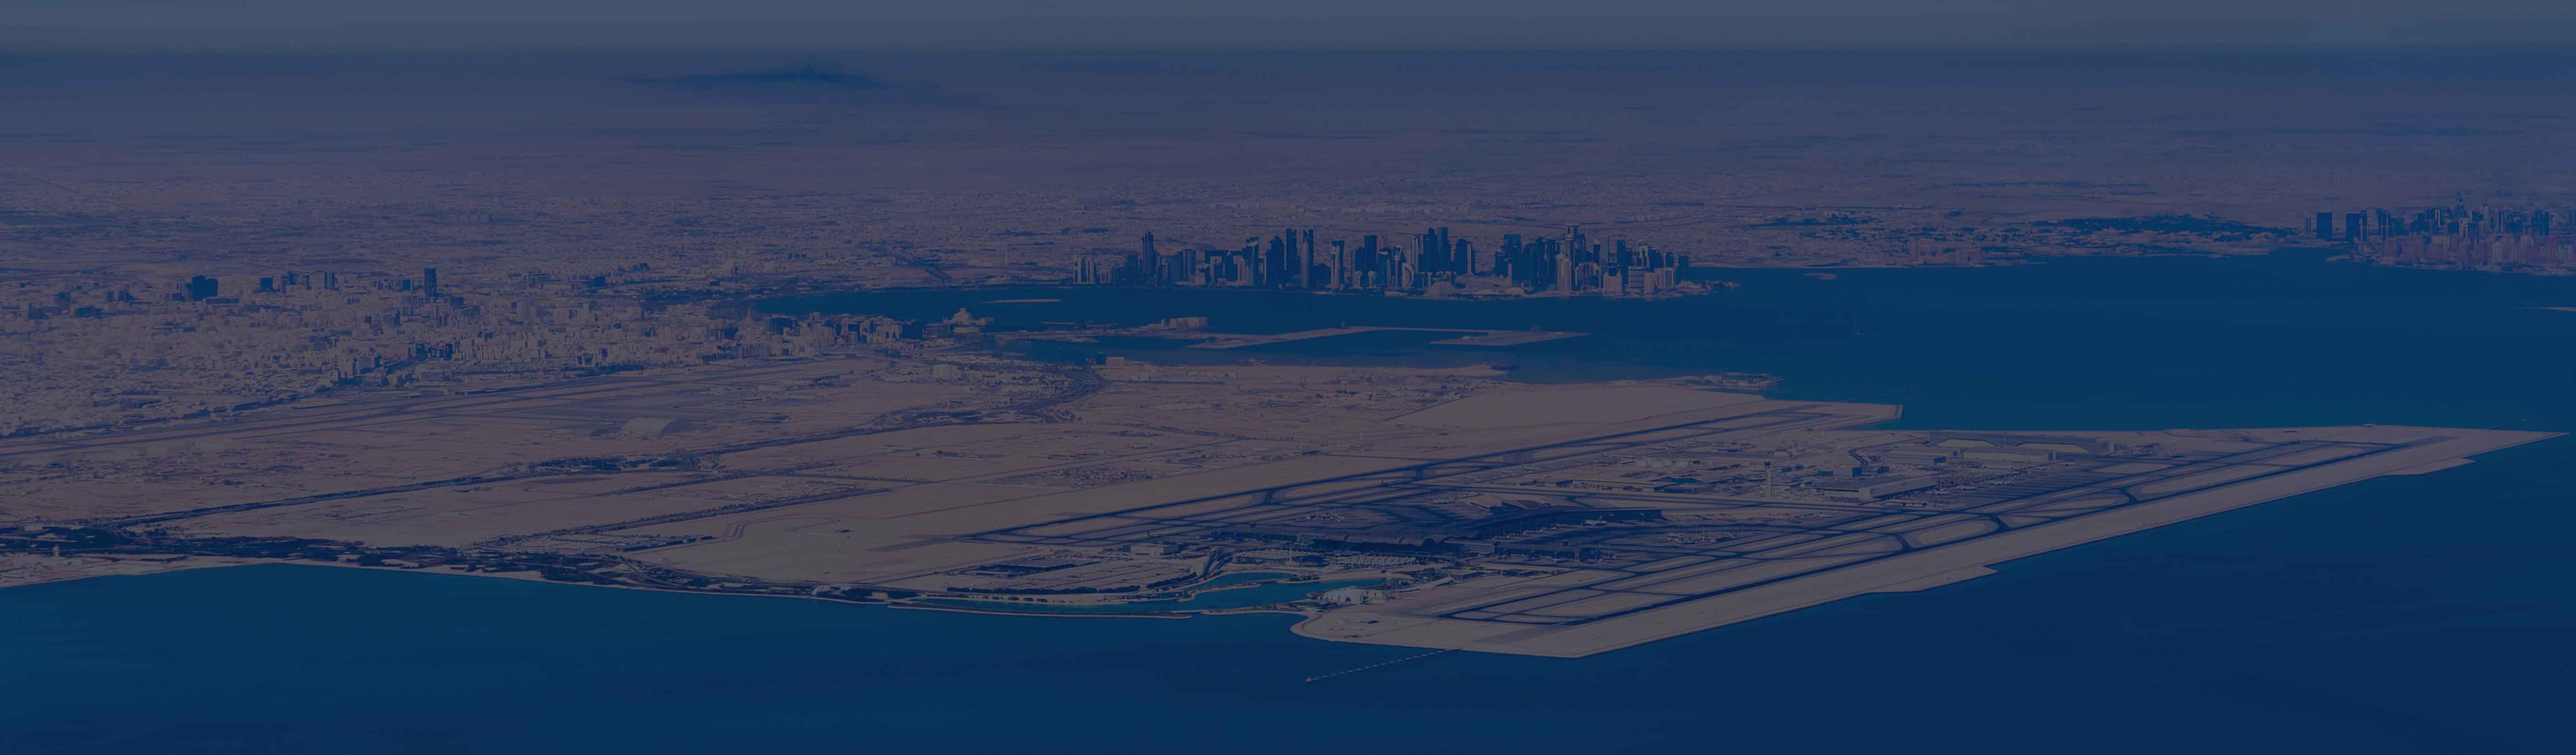 Hamad International Airport